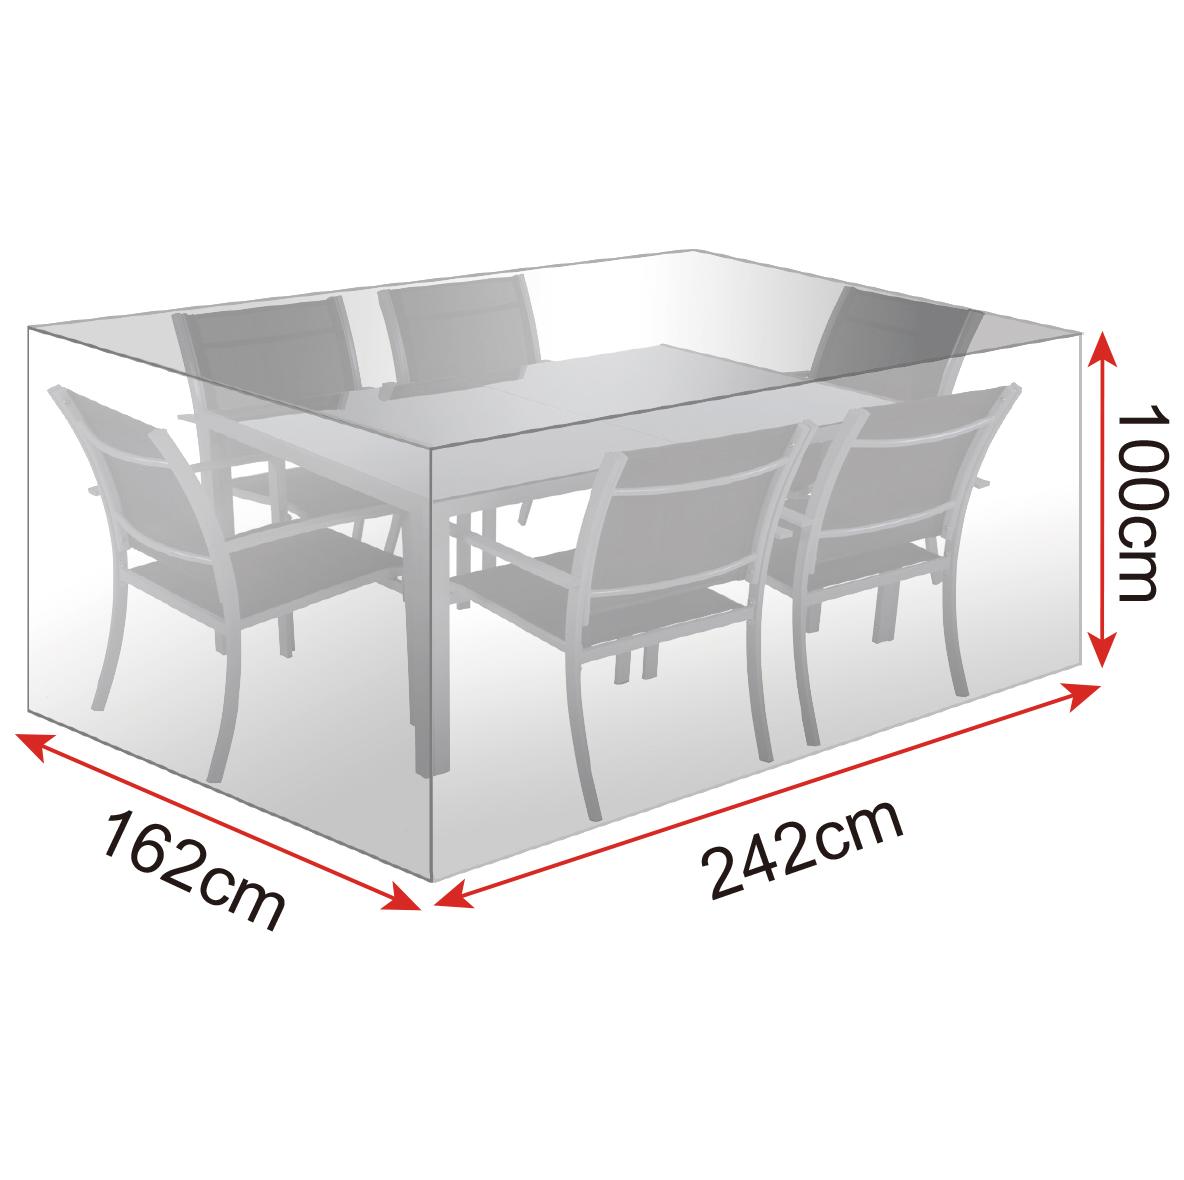 schutzh lle abdeckhaube f r sitzgruppe gartenm bel plane transparent gz1194tp ebay. Black Bedroom Furniture Sets. Home Design Ideas